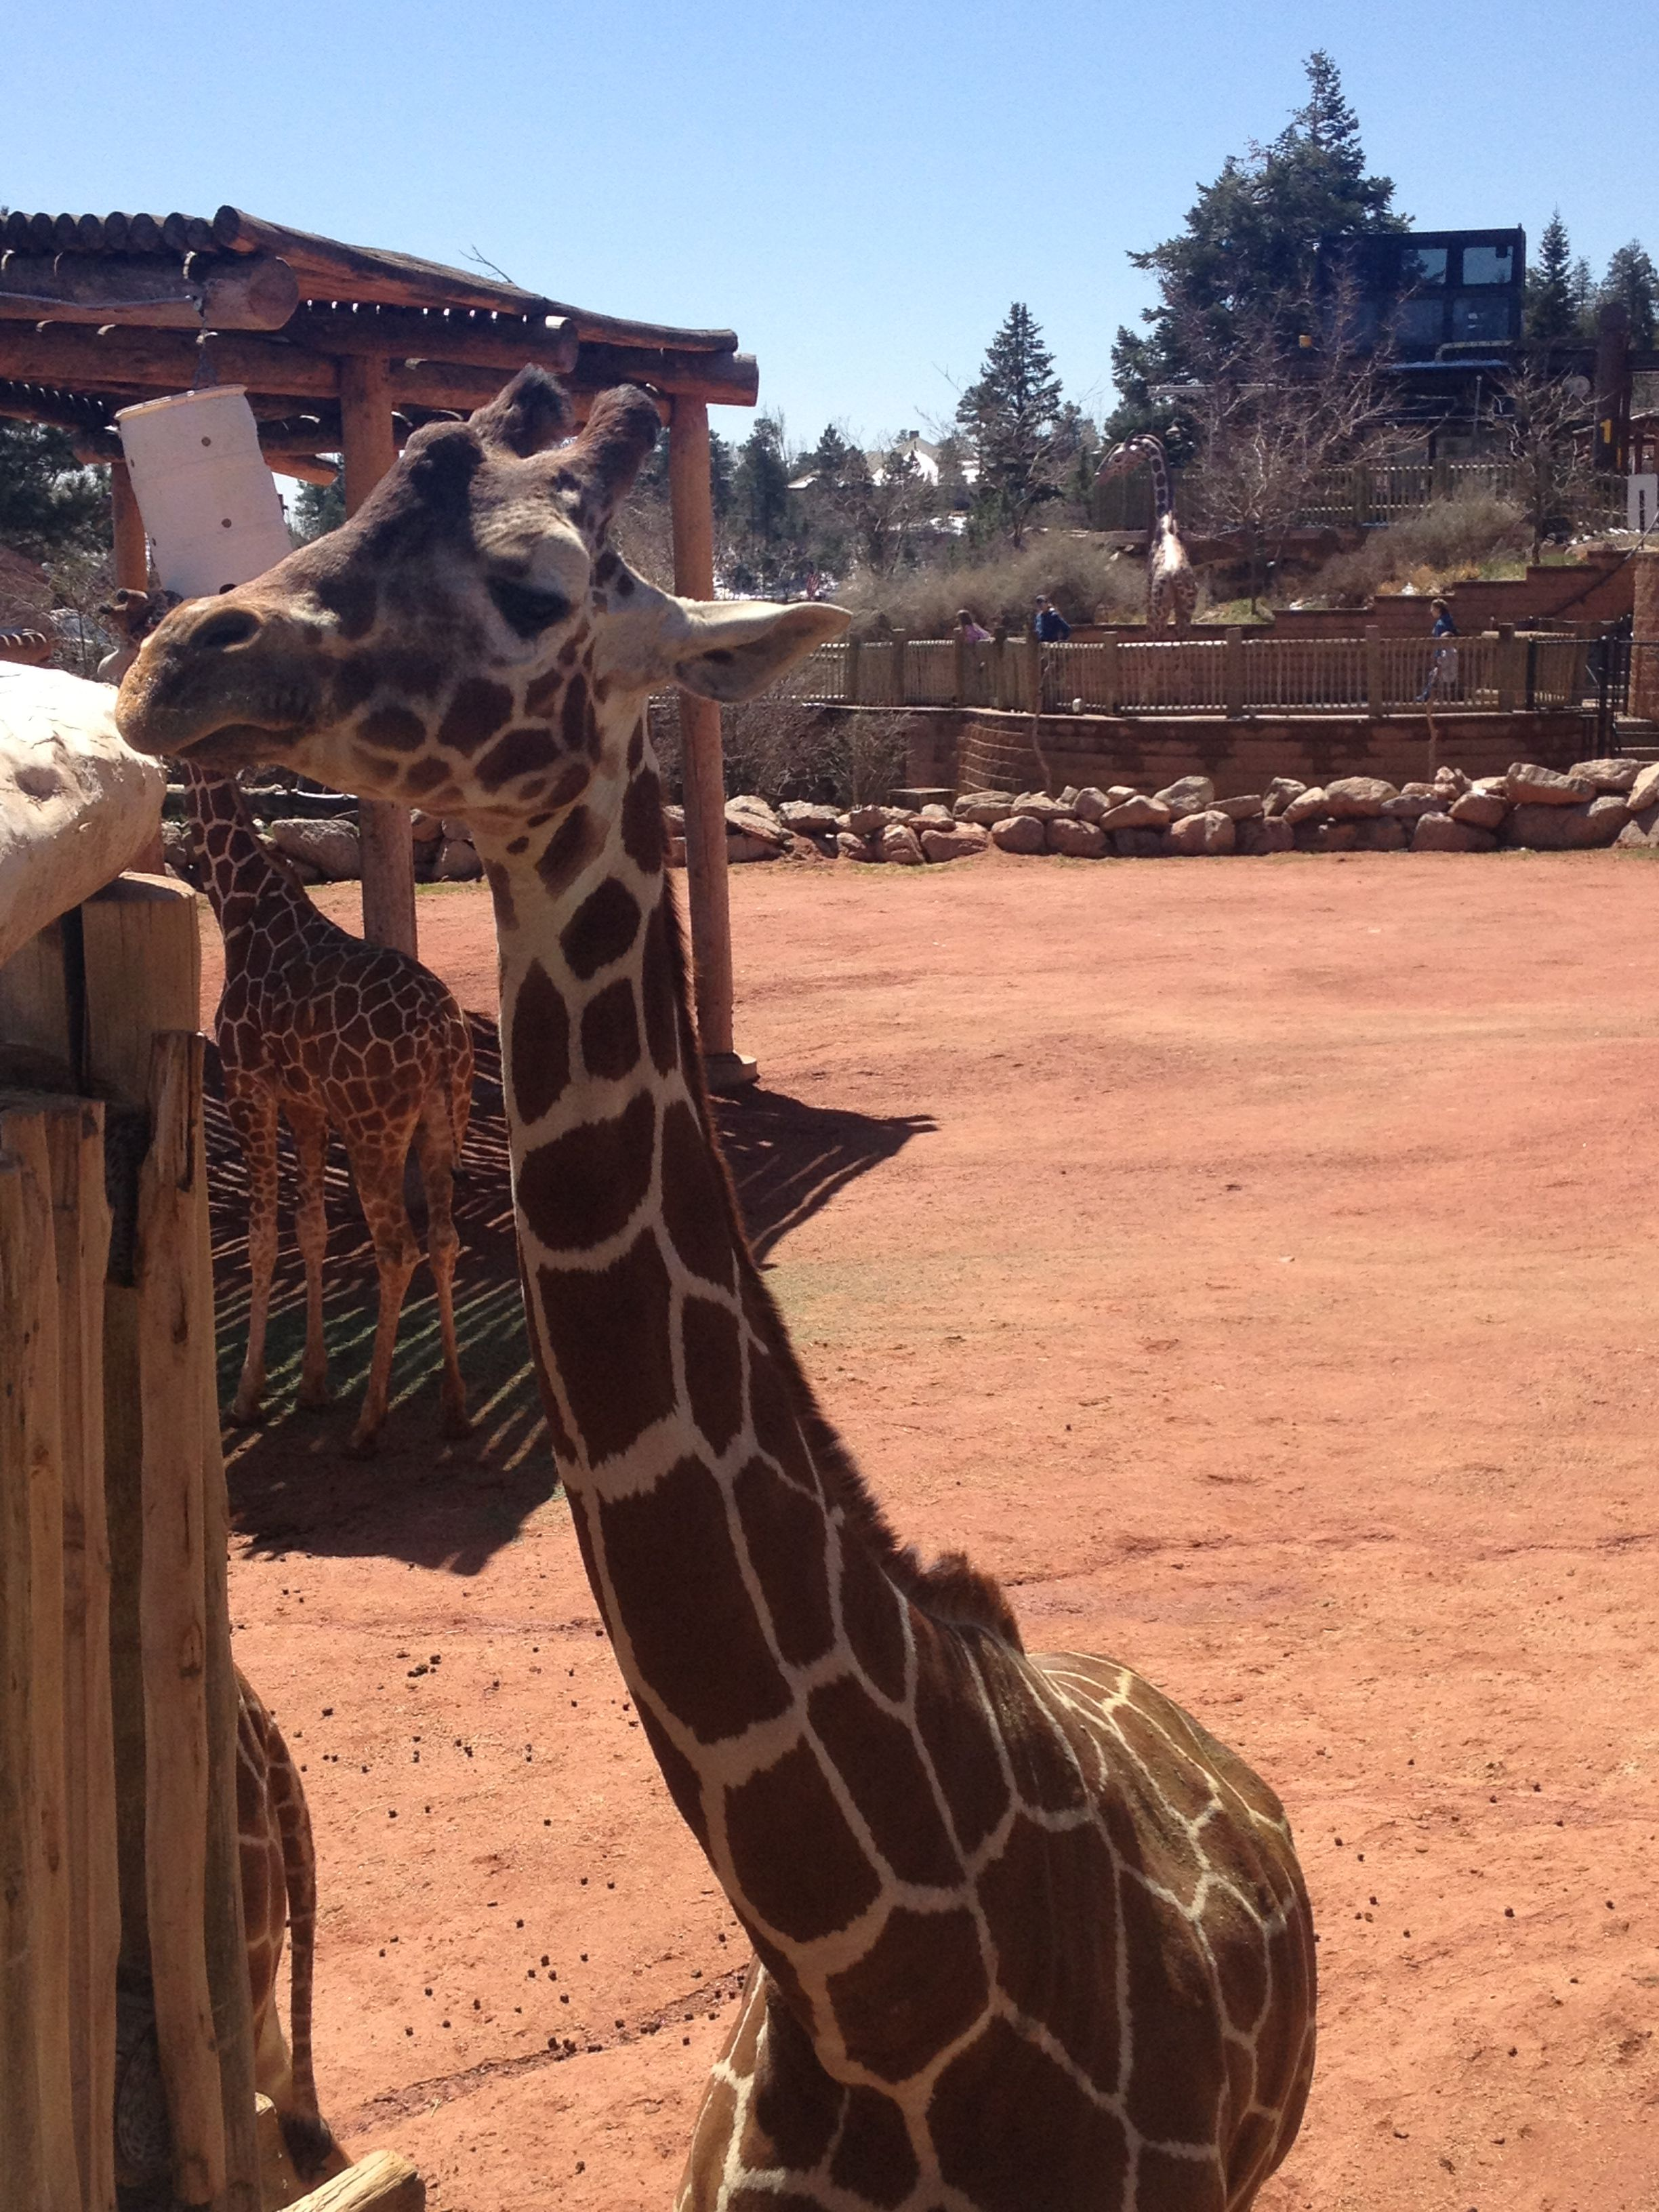 Cheyenne Mountain Zoo Pikes Peak Region Attractions Cheyenne Mountain Cheyenne Mountain Zoo Zoo